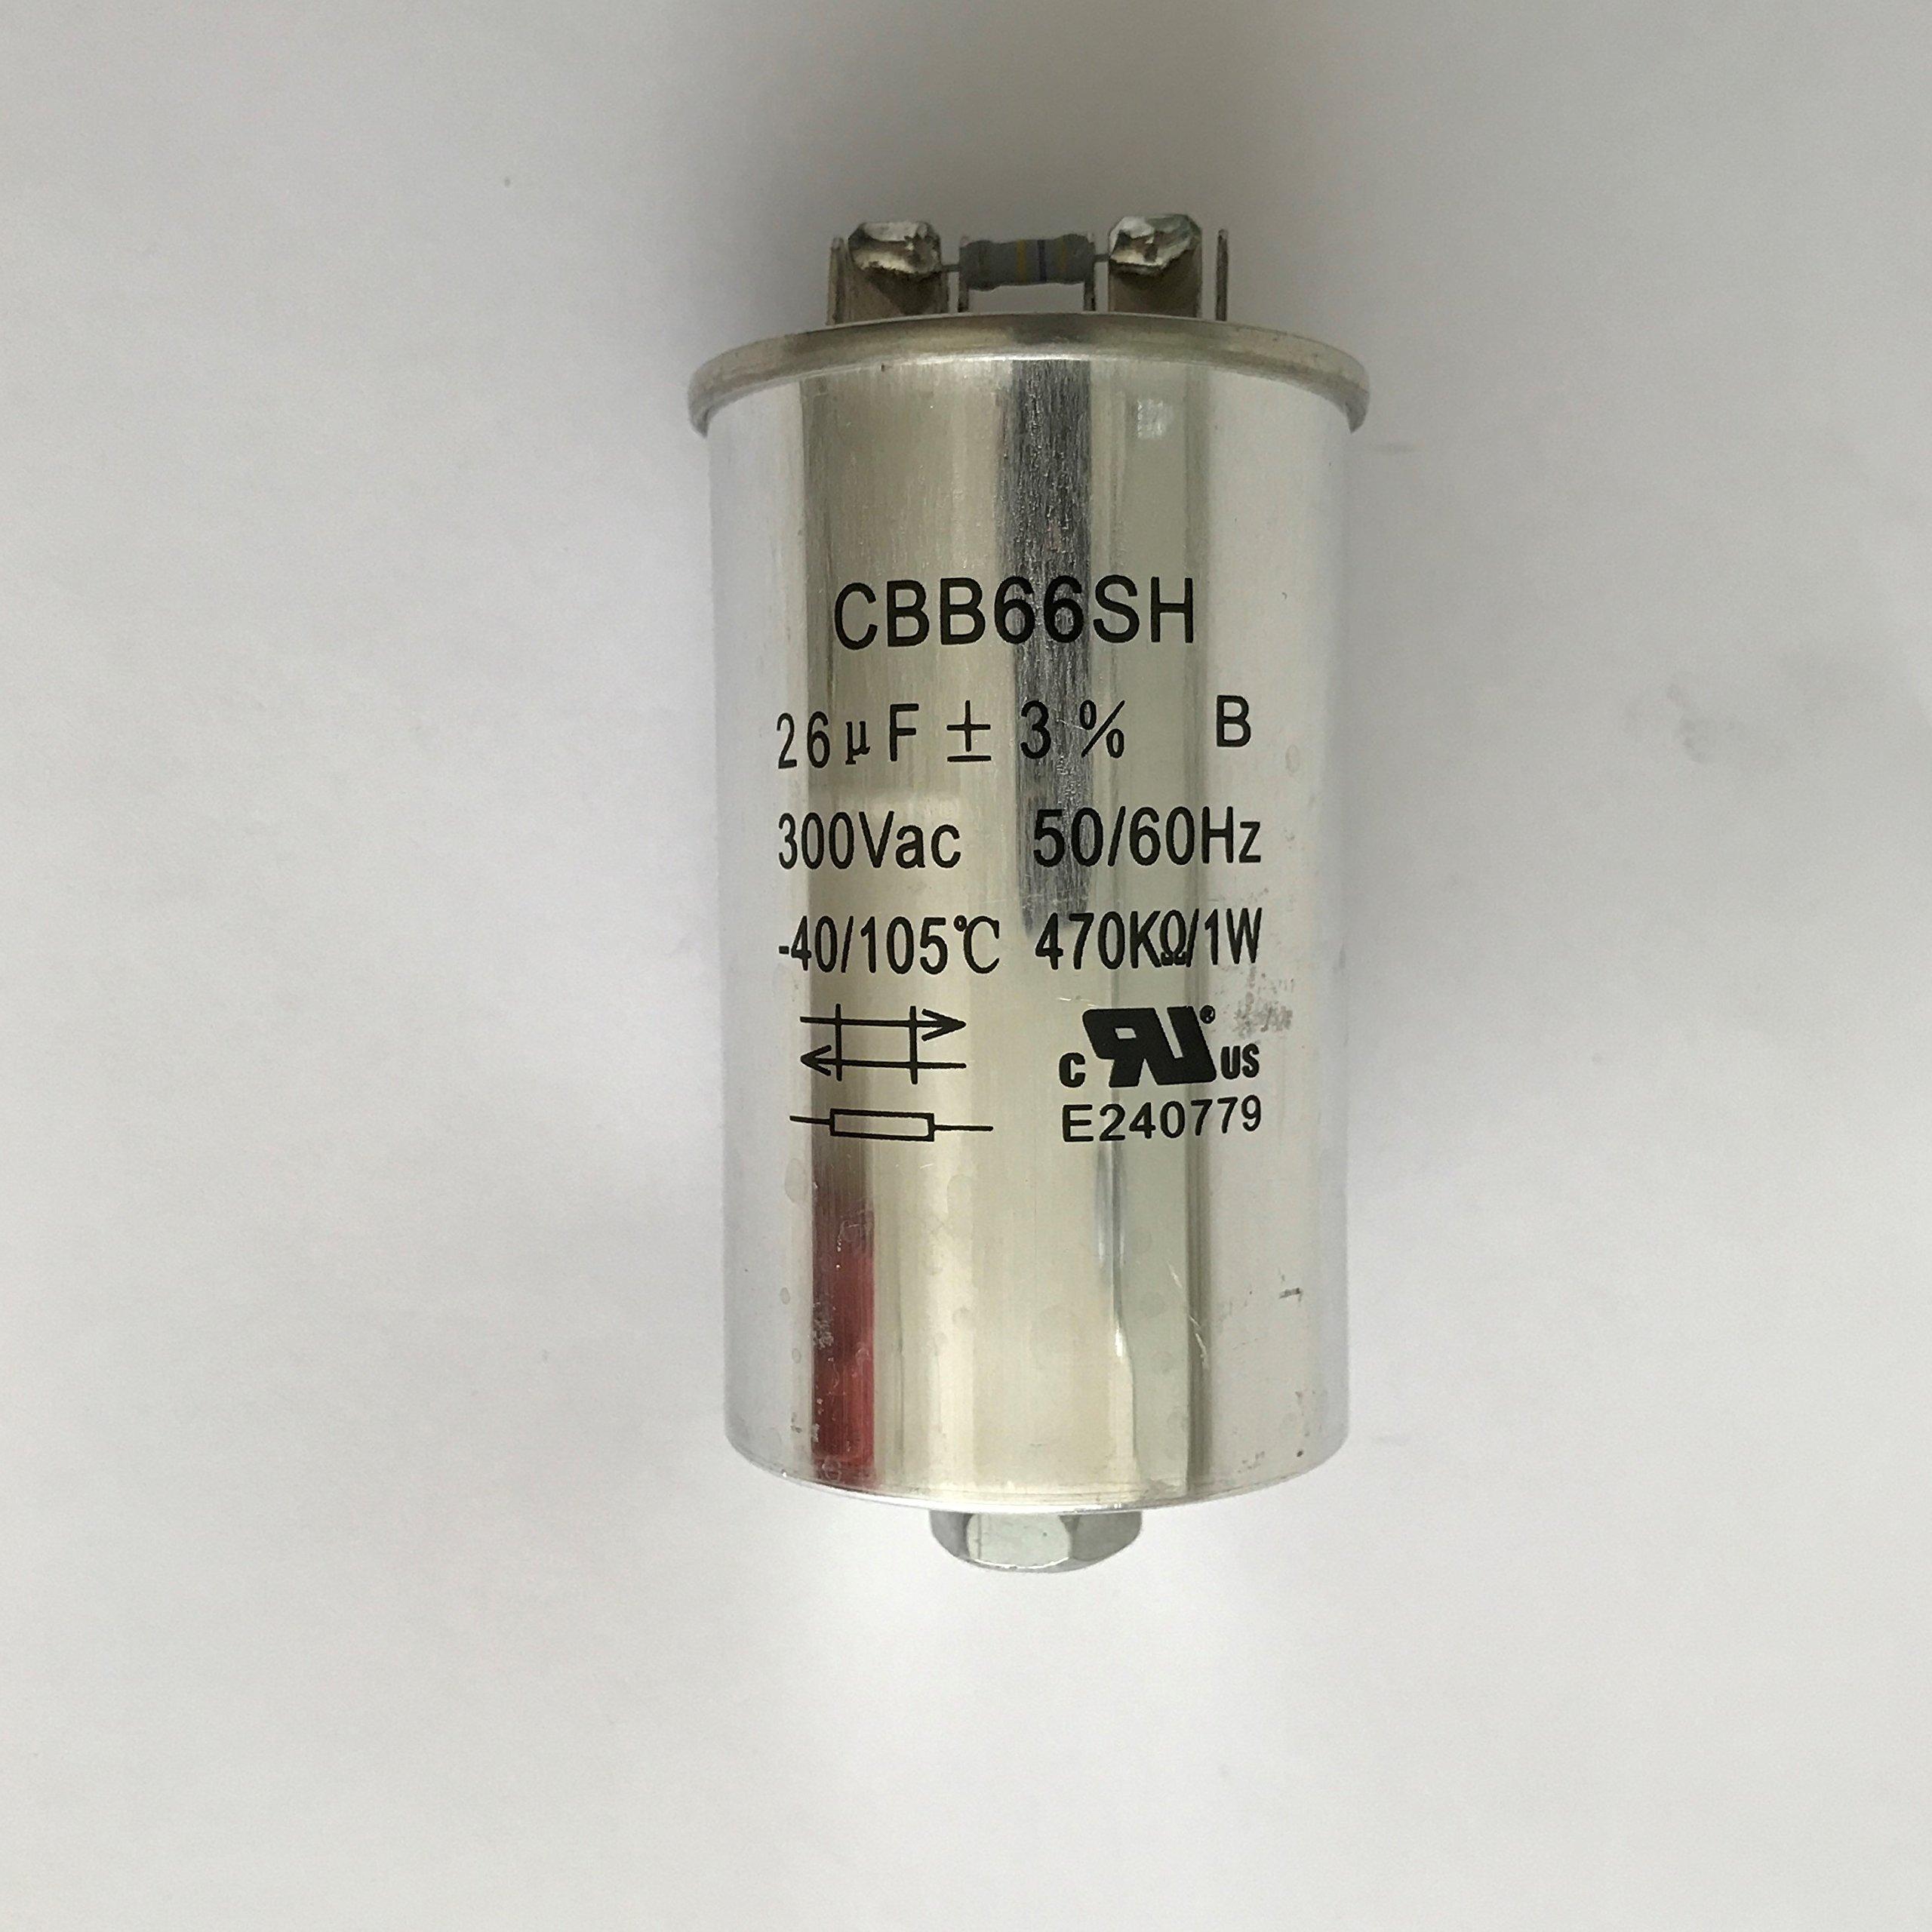 Capacitor 26uF/300VAC 120-480 Volt for Metal Halide 350 Watt-PS (1 Piece)